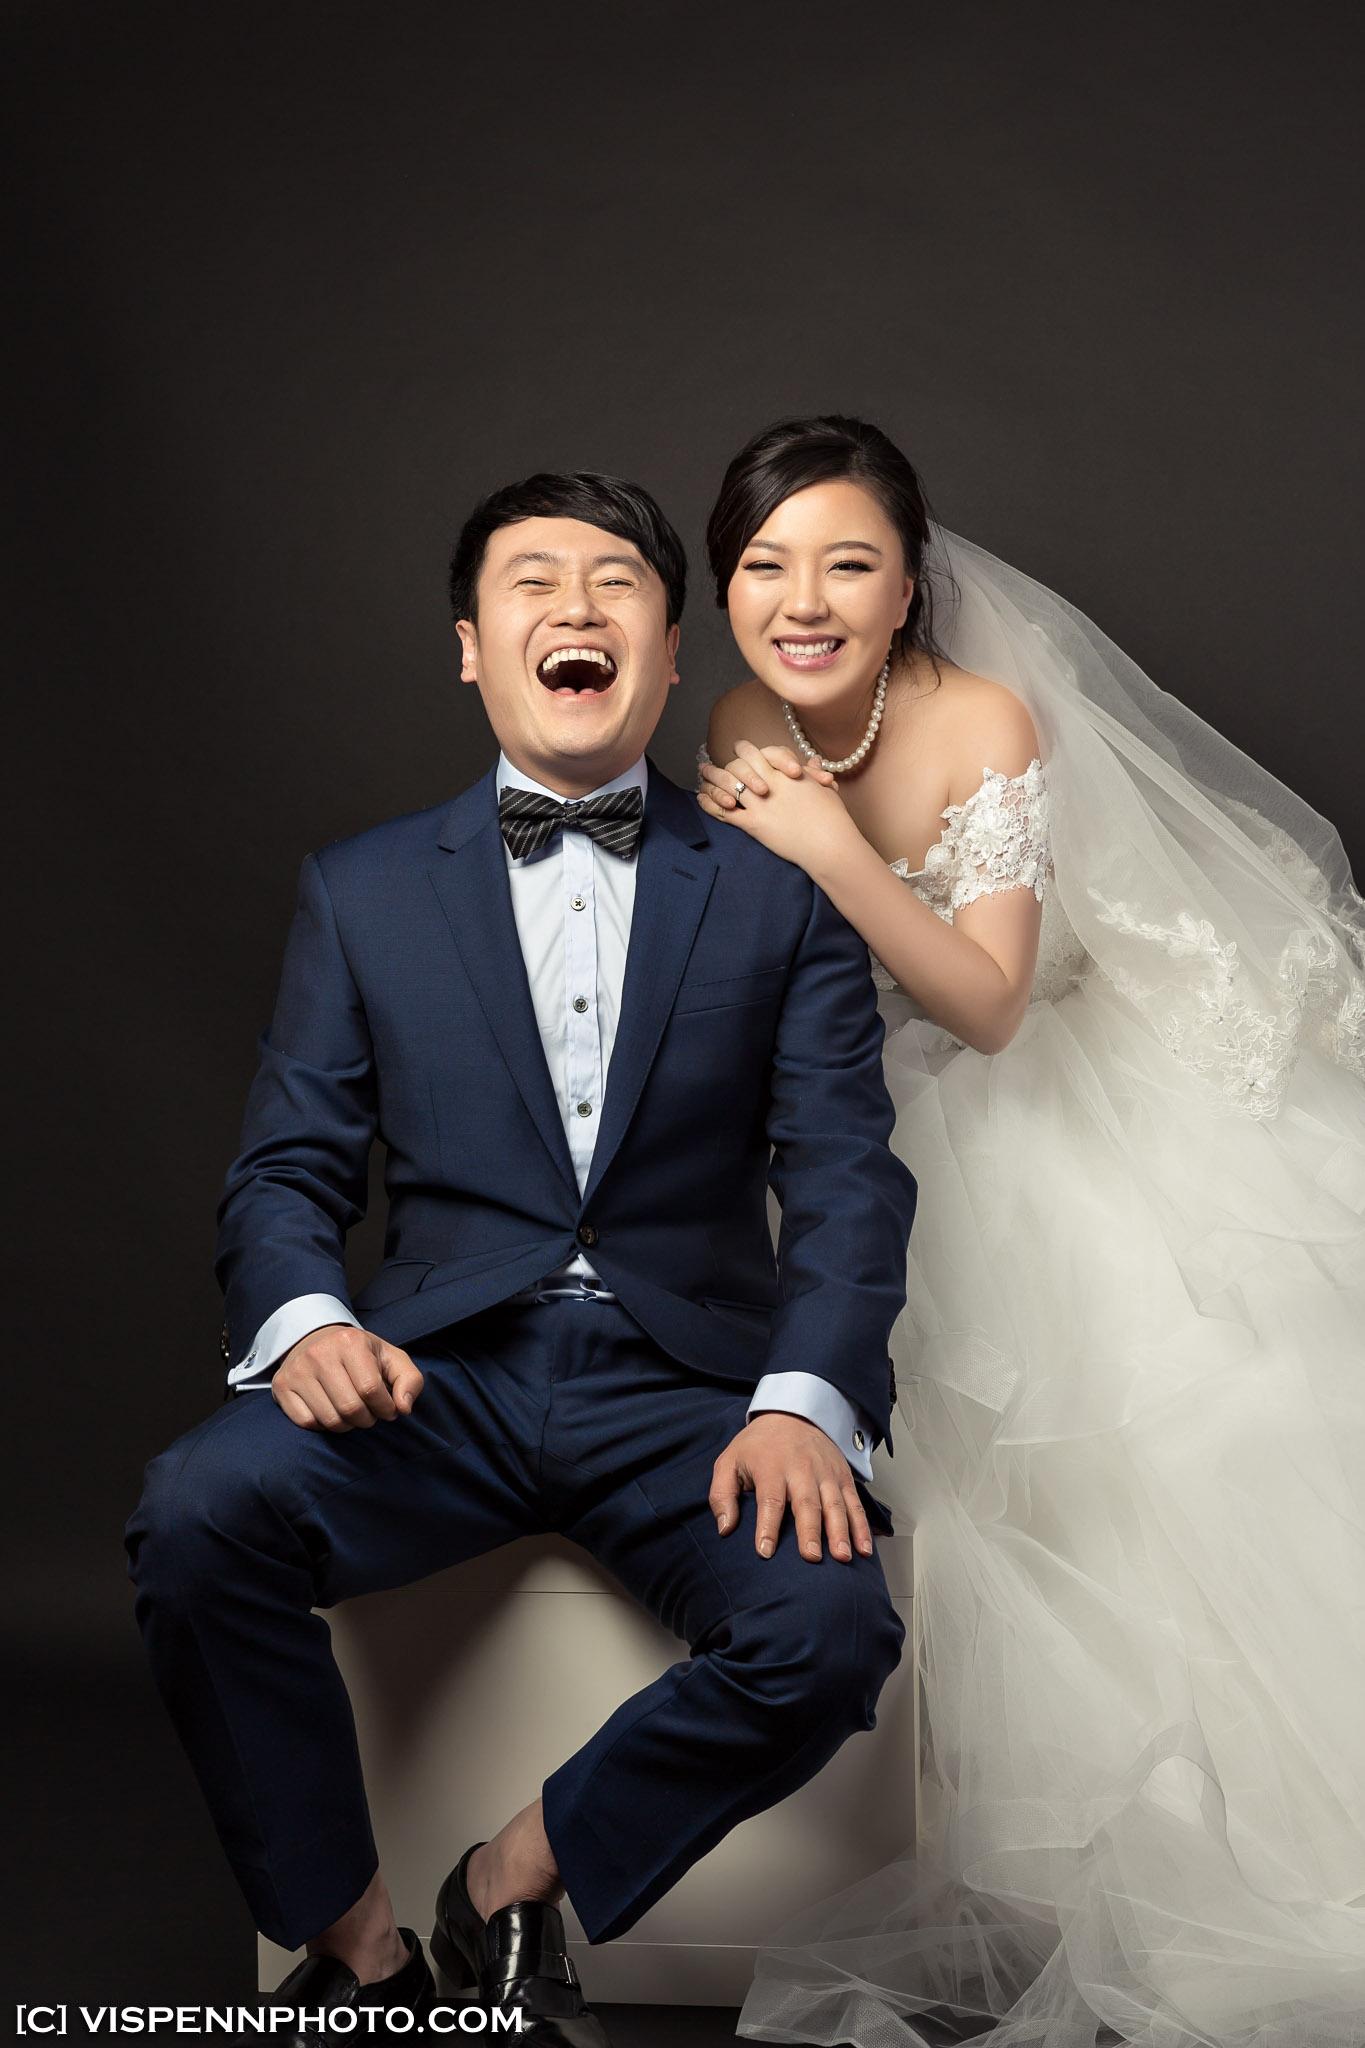 PRE WEDDING Photography Melbourne VISPENN 墨尔本 婚纱照 结婚照 婚纱摄影 VISPENN 2505